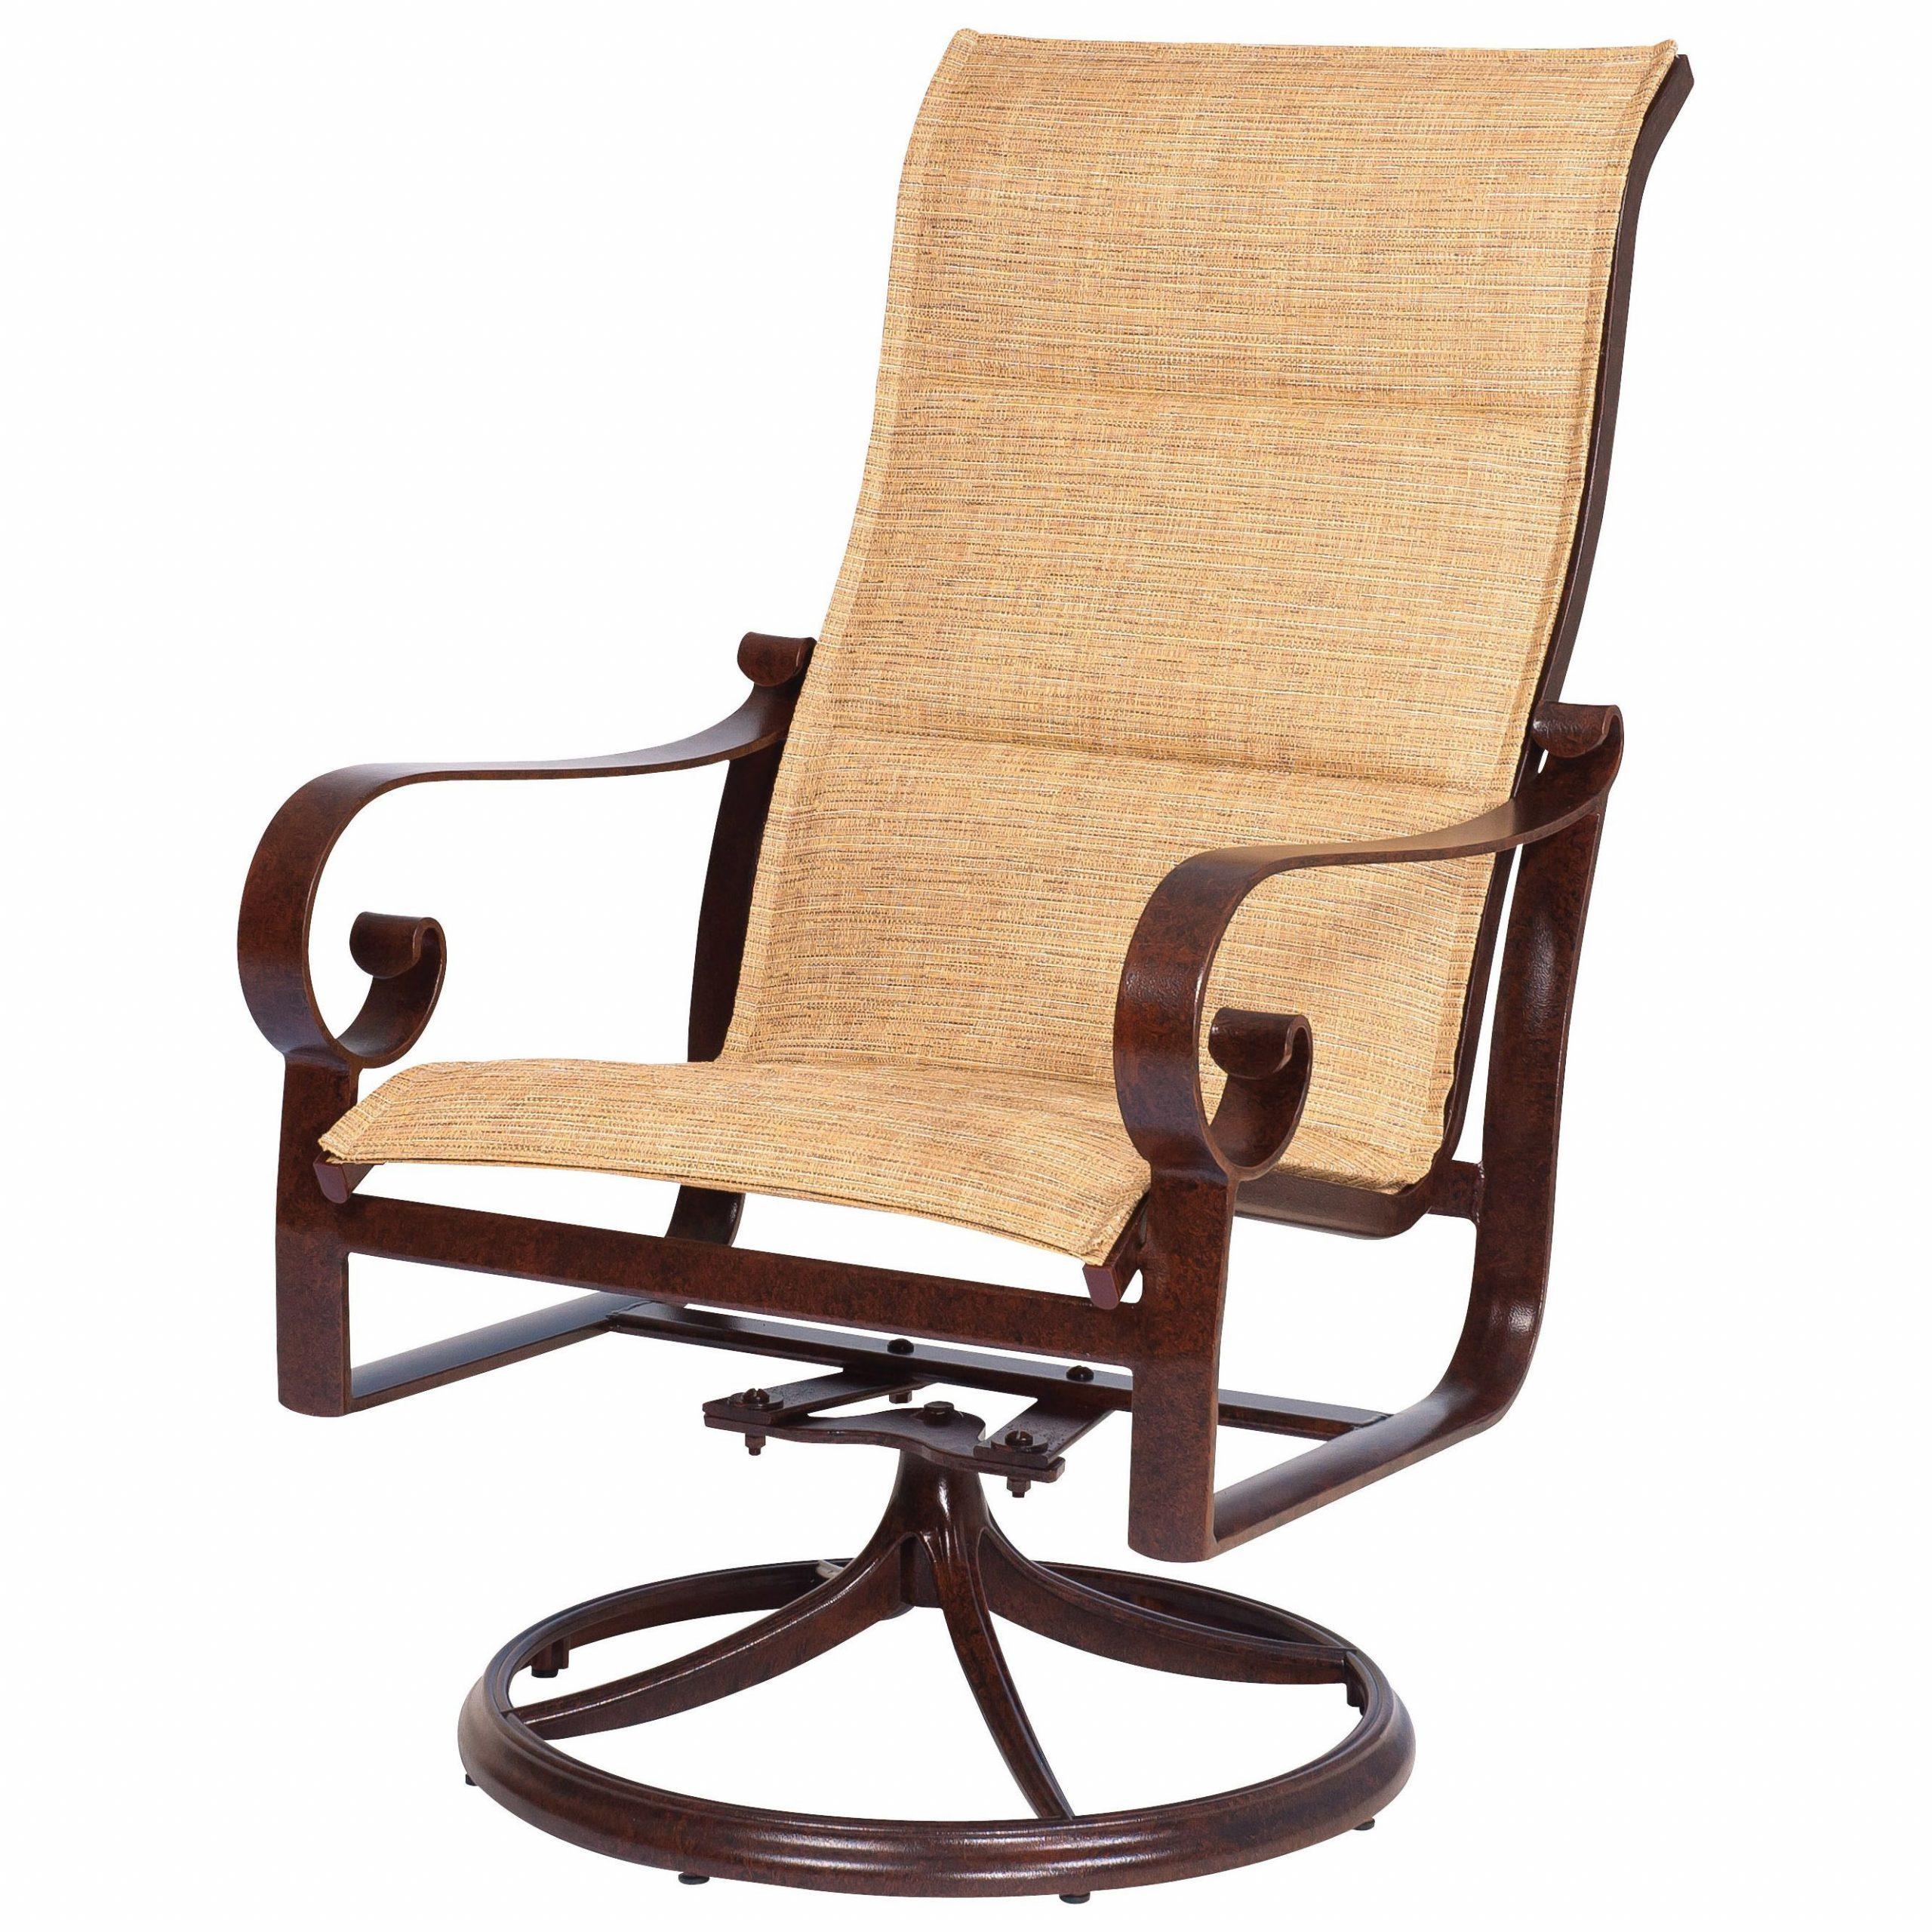 Most Recent Woodard Belden Padded Sling Aluminum High Back Swivel Rocker Throughout Padded Sling High Back Swivel Chairs (Gallery 2 of 30)